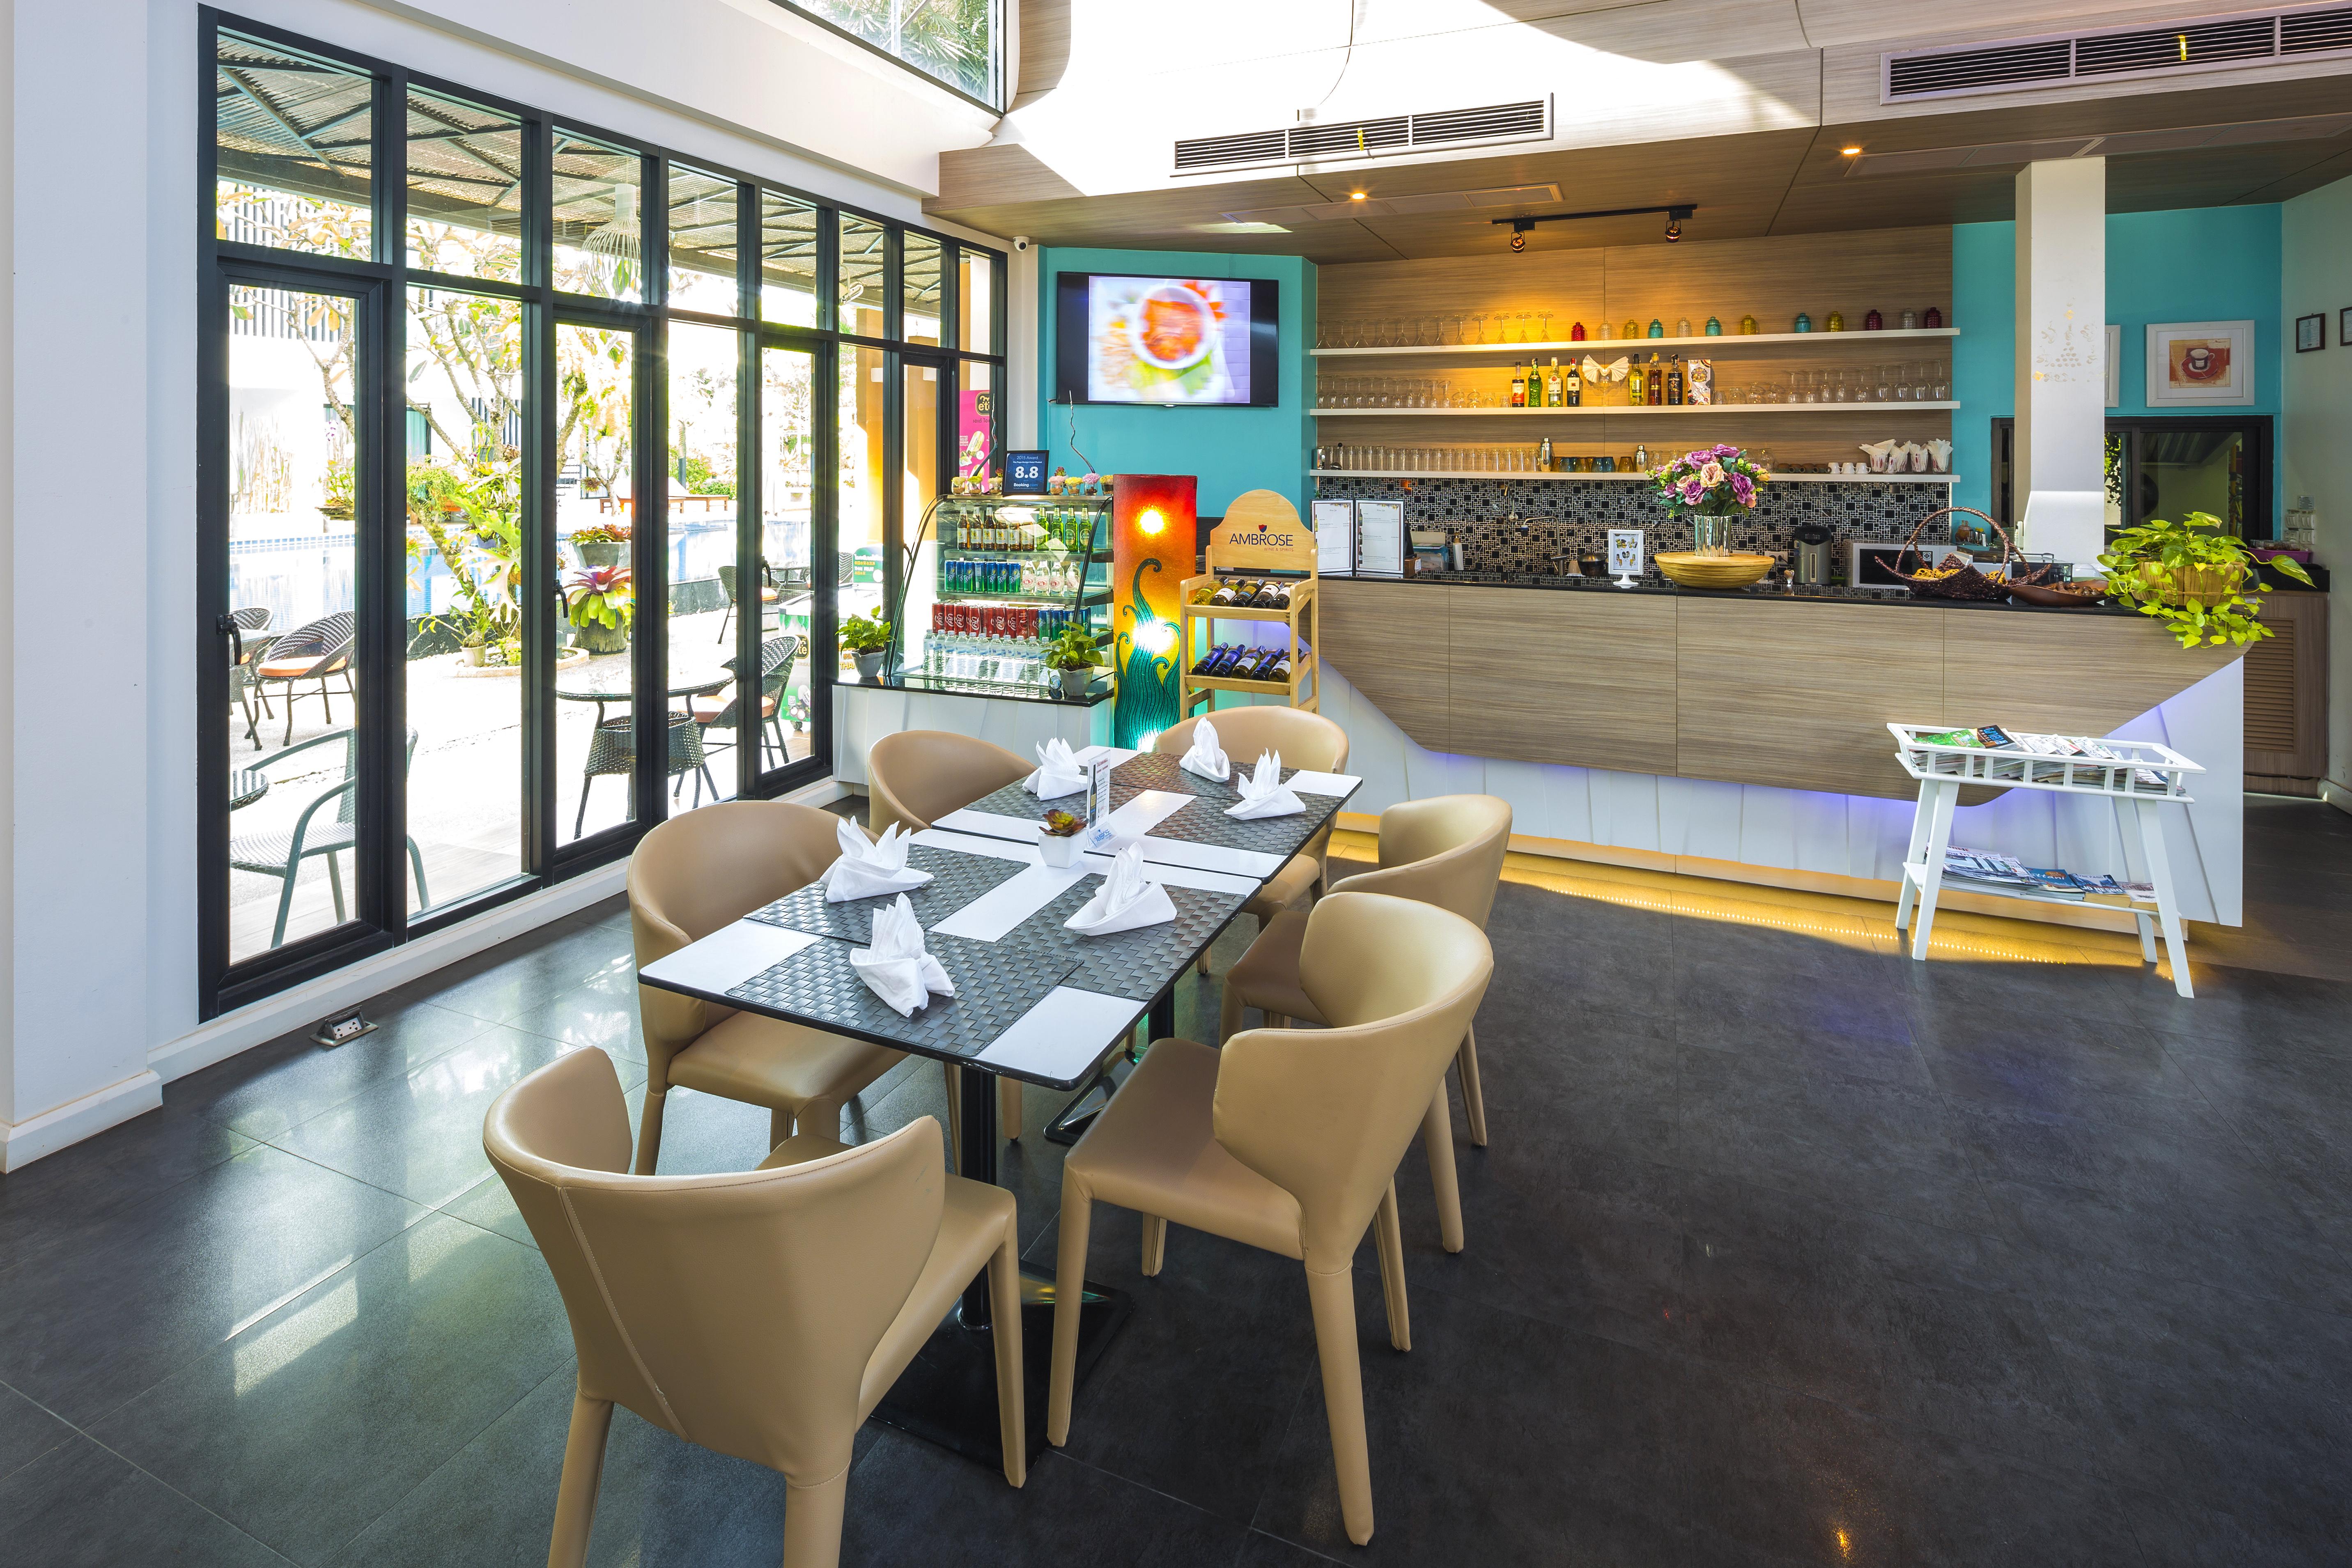 Pago 88 Restaurant